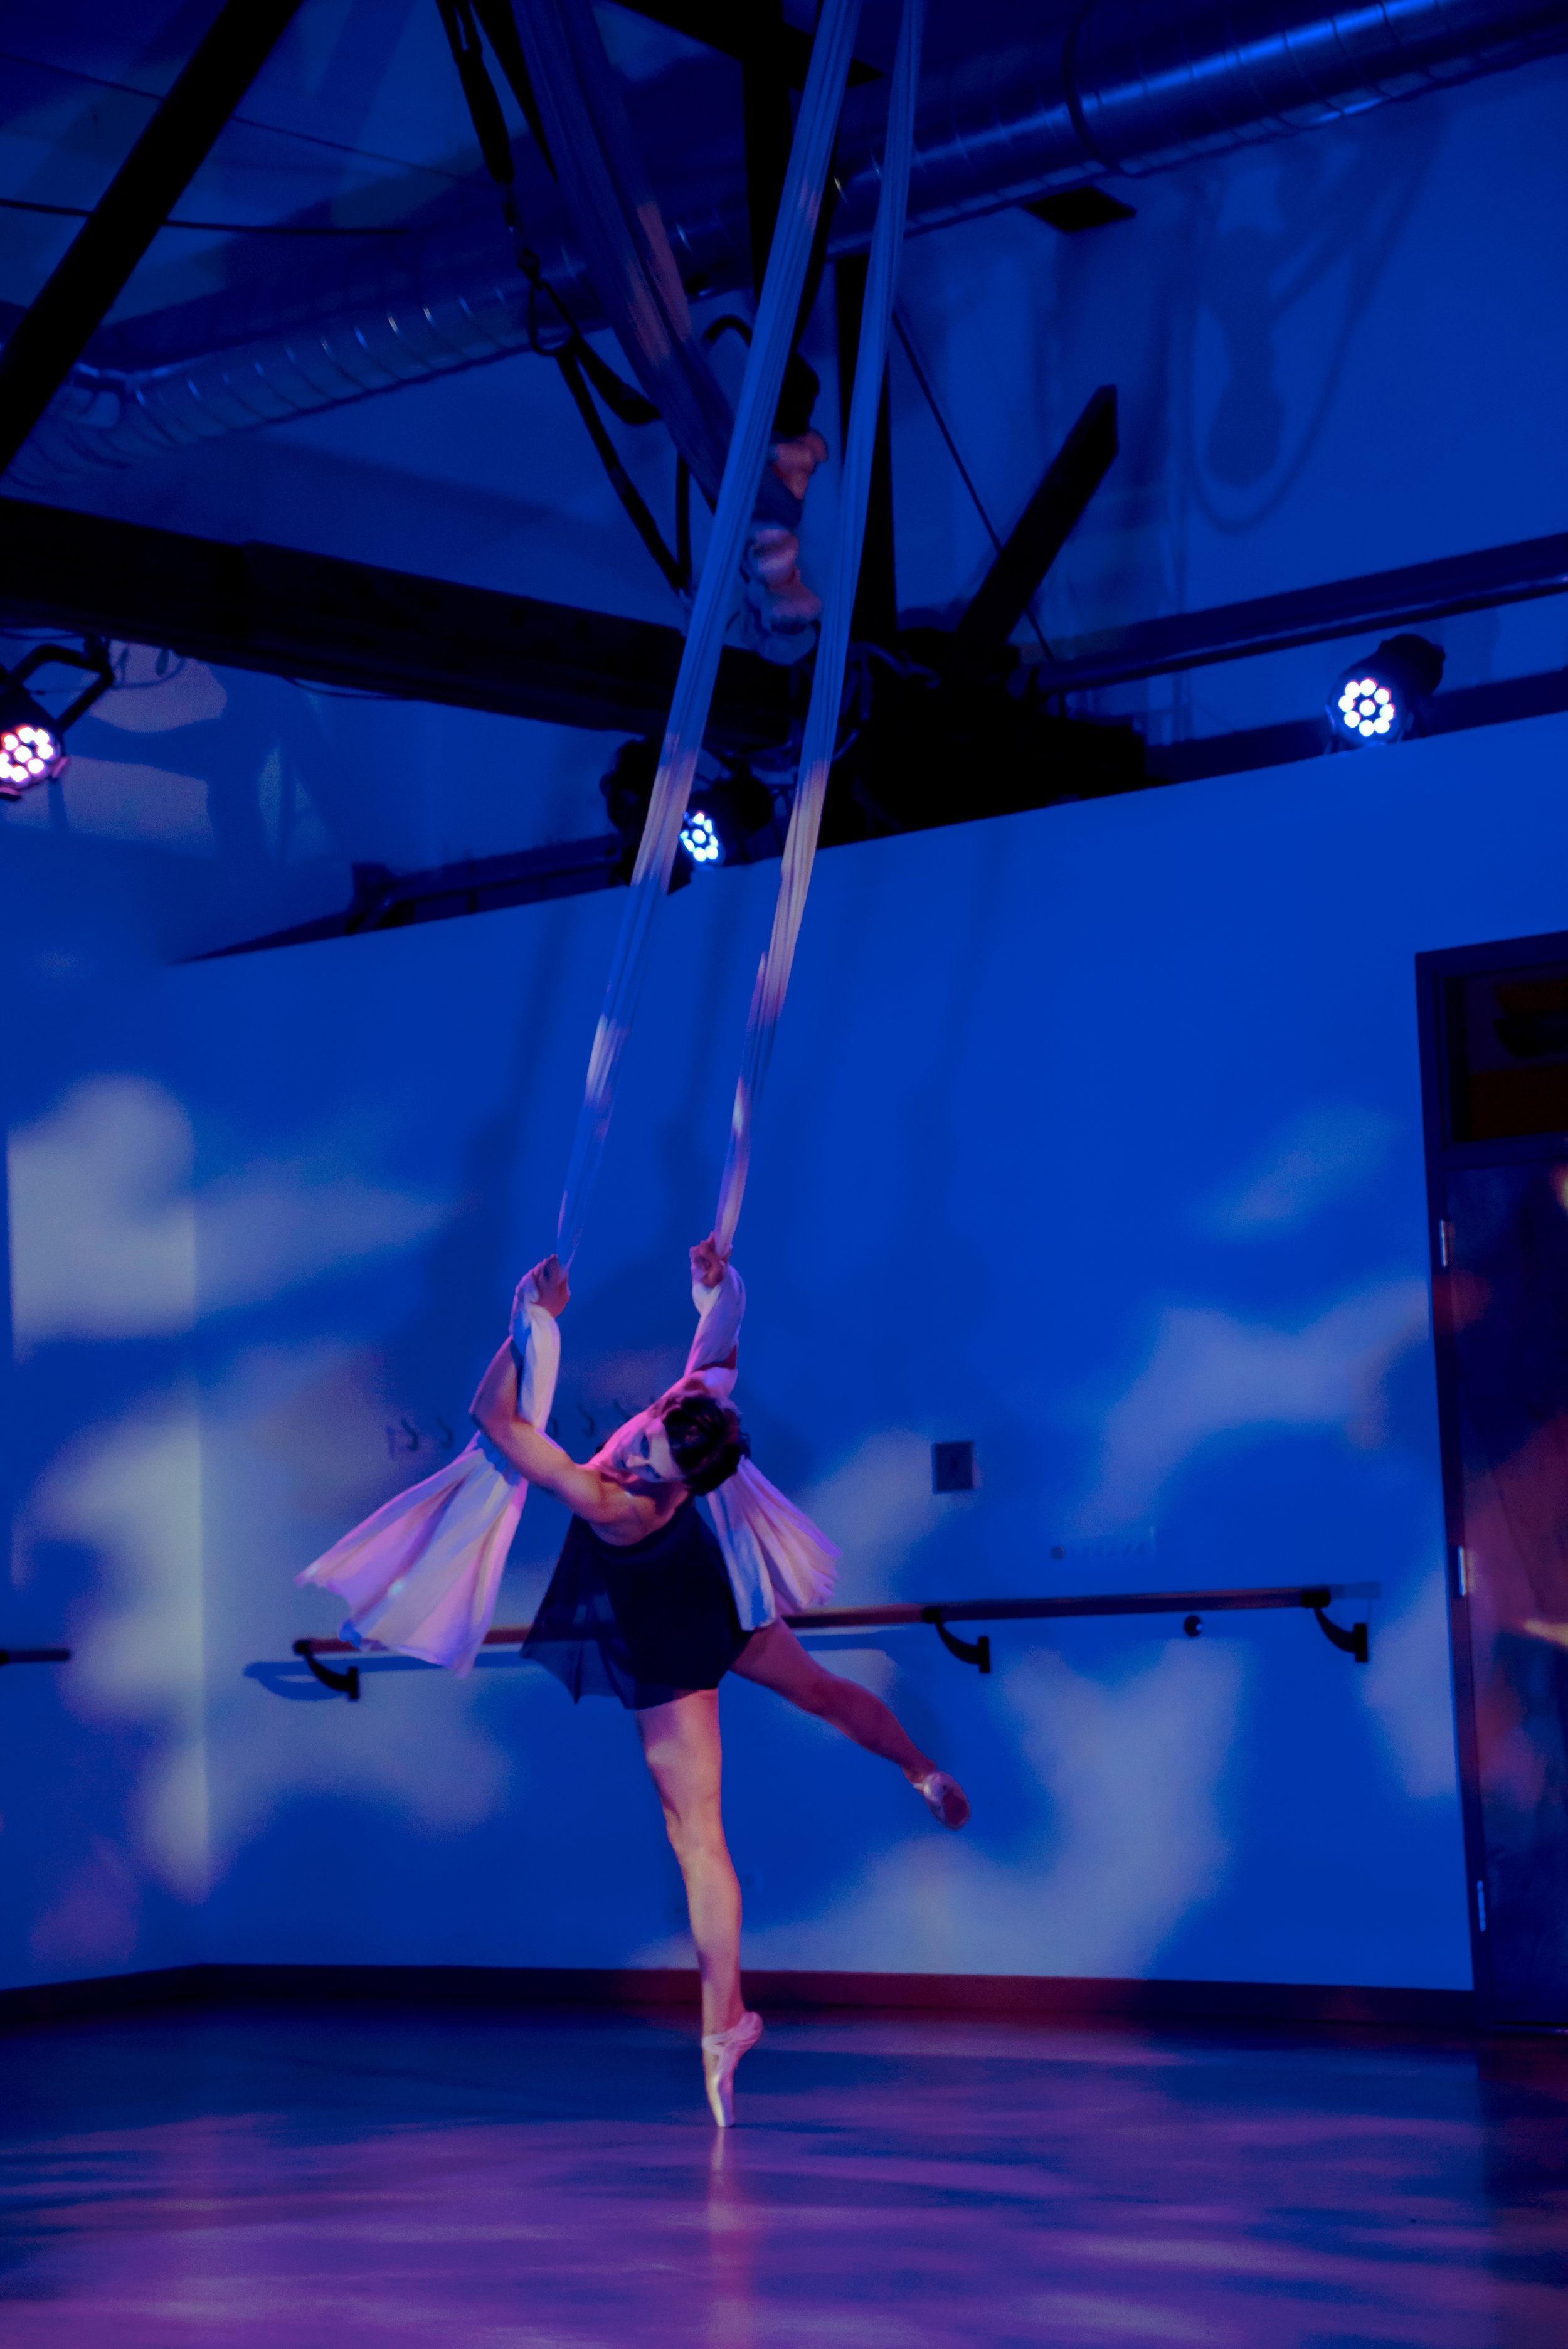 aerial dance chicago-6046 copy 2.jpg